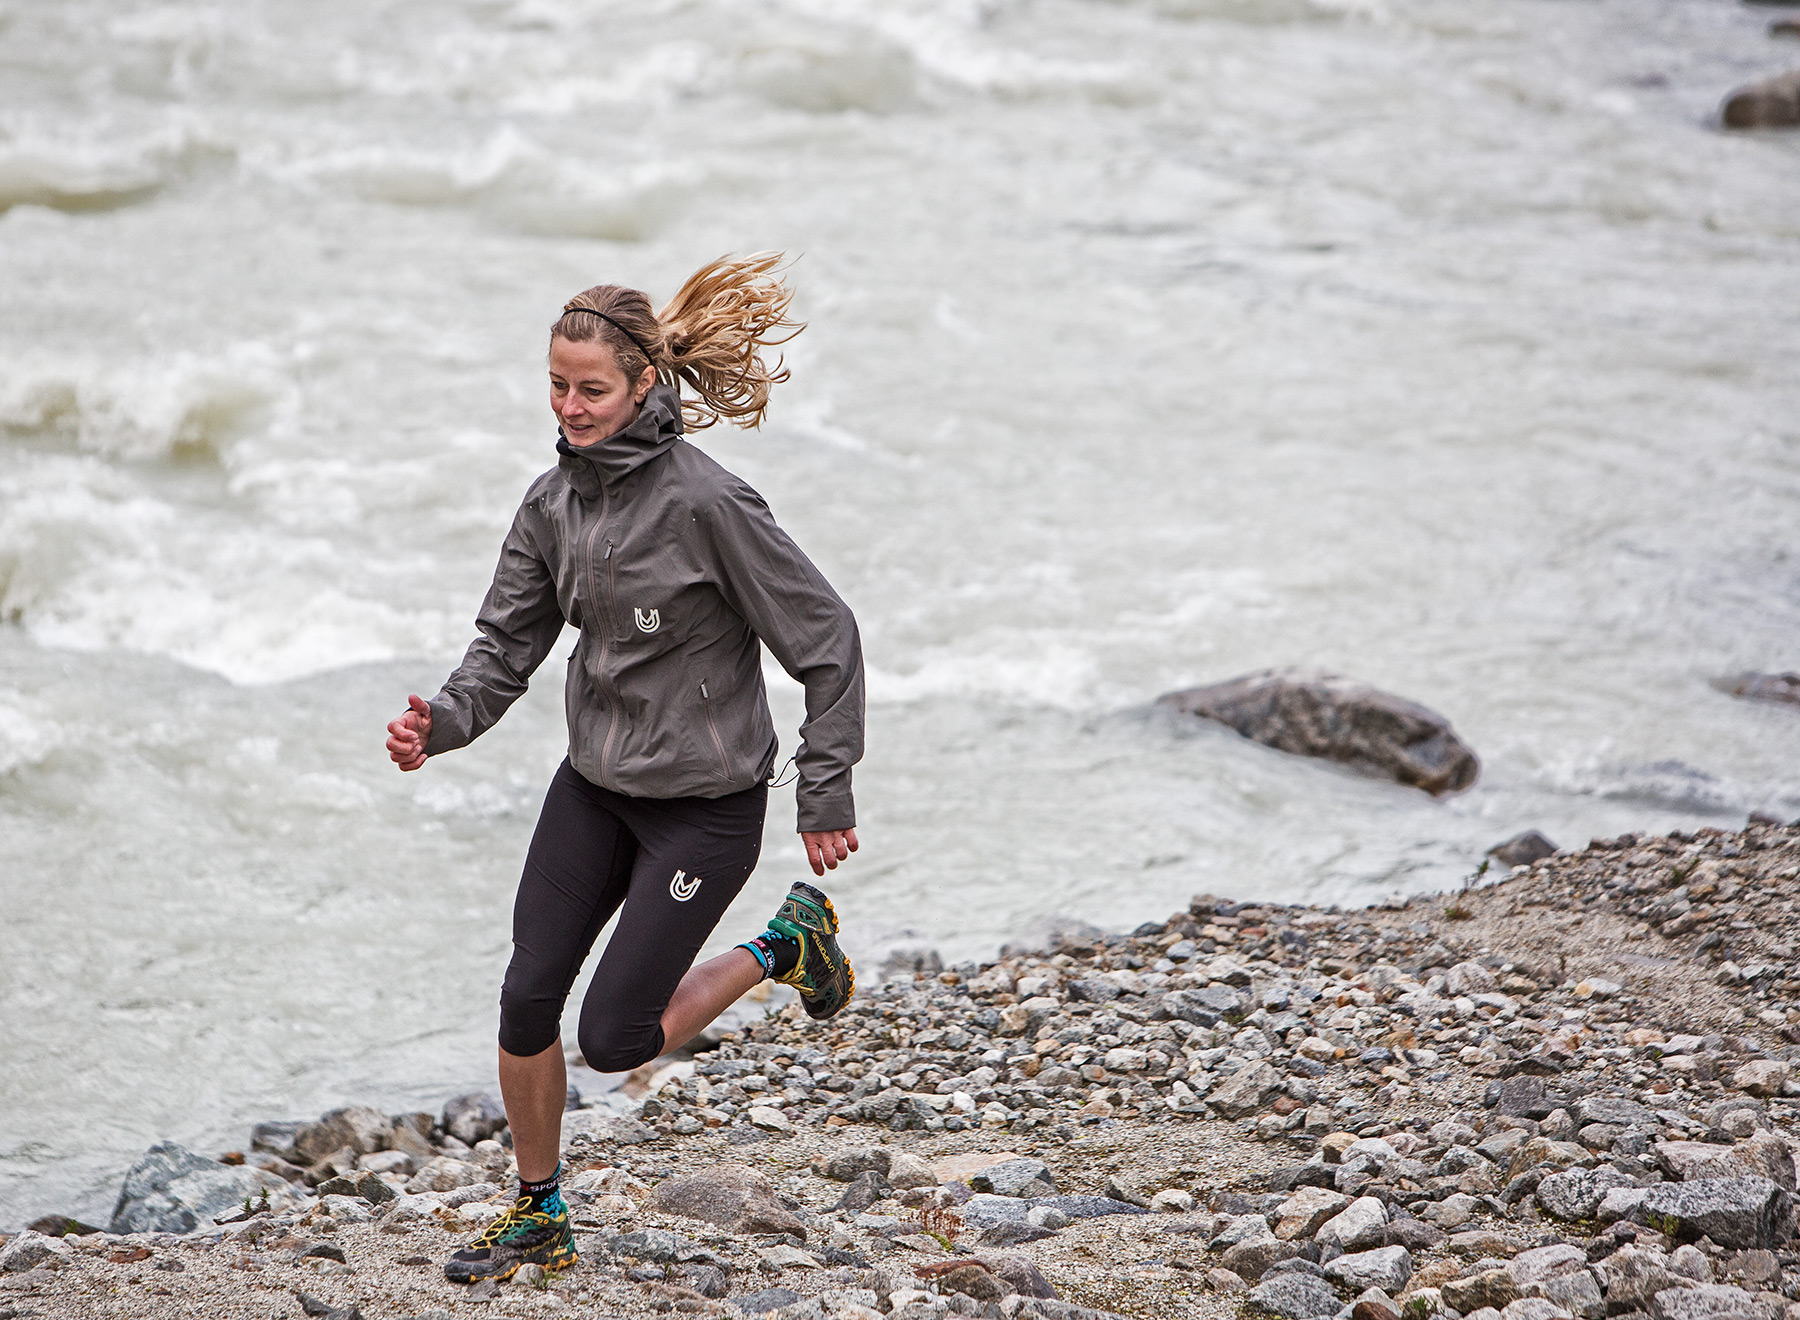 5-UVU-Anne-Marie-Flammersfeld-Running-Engadin